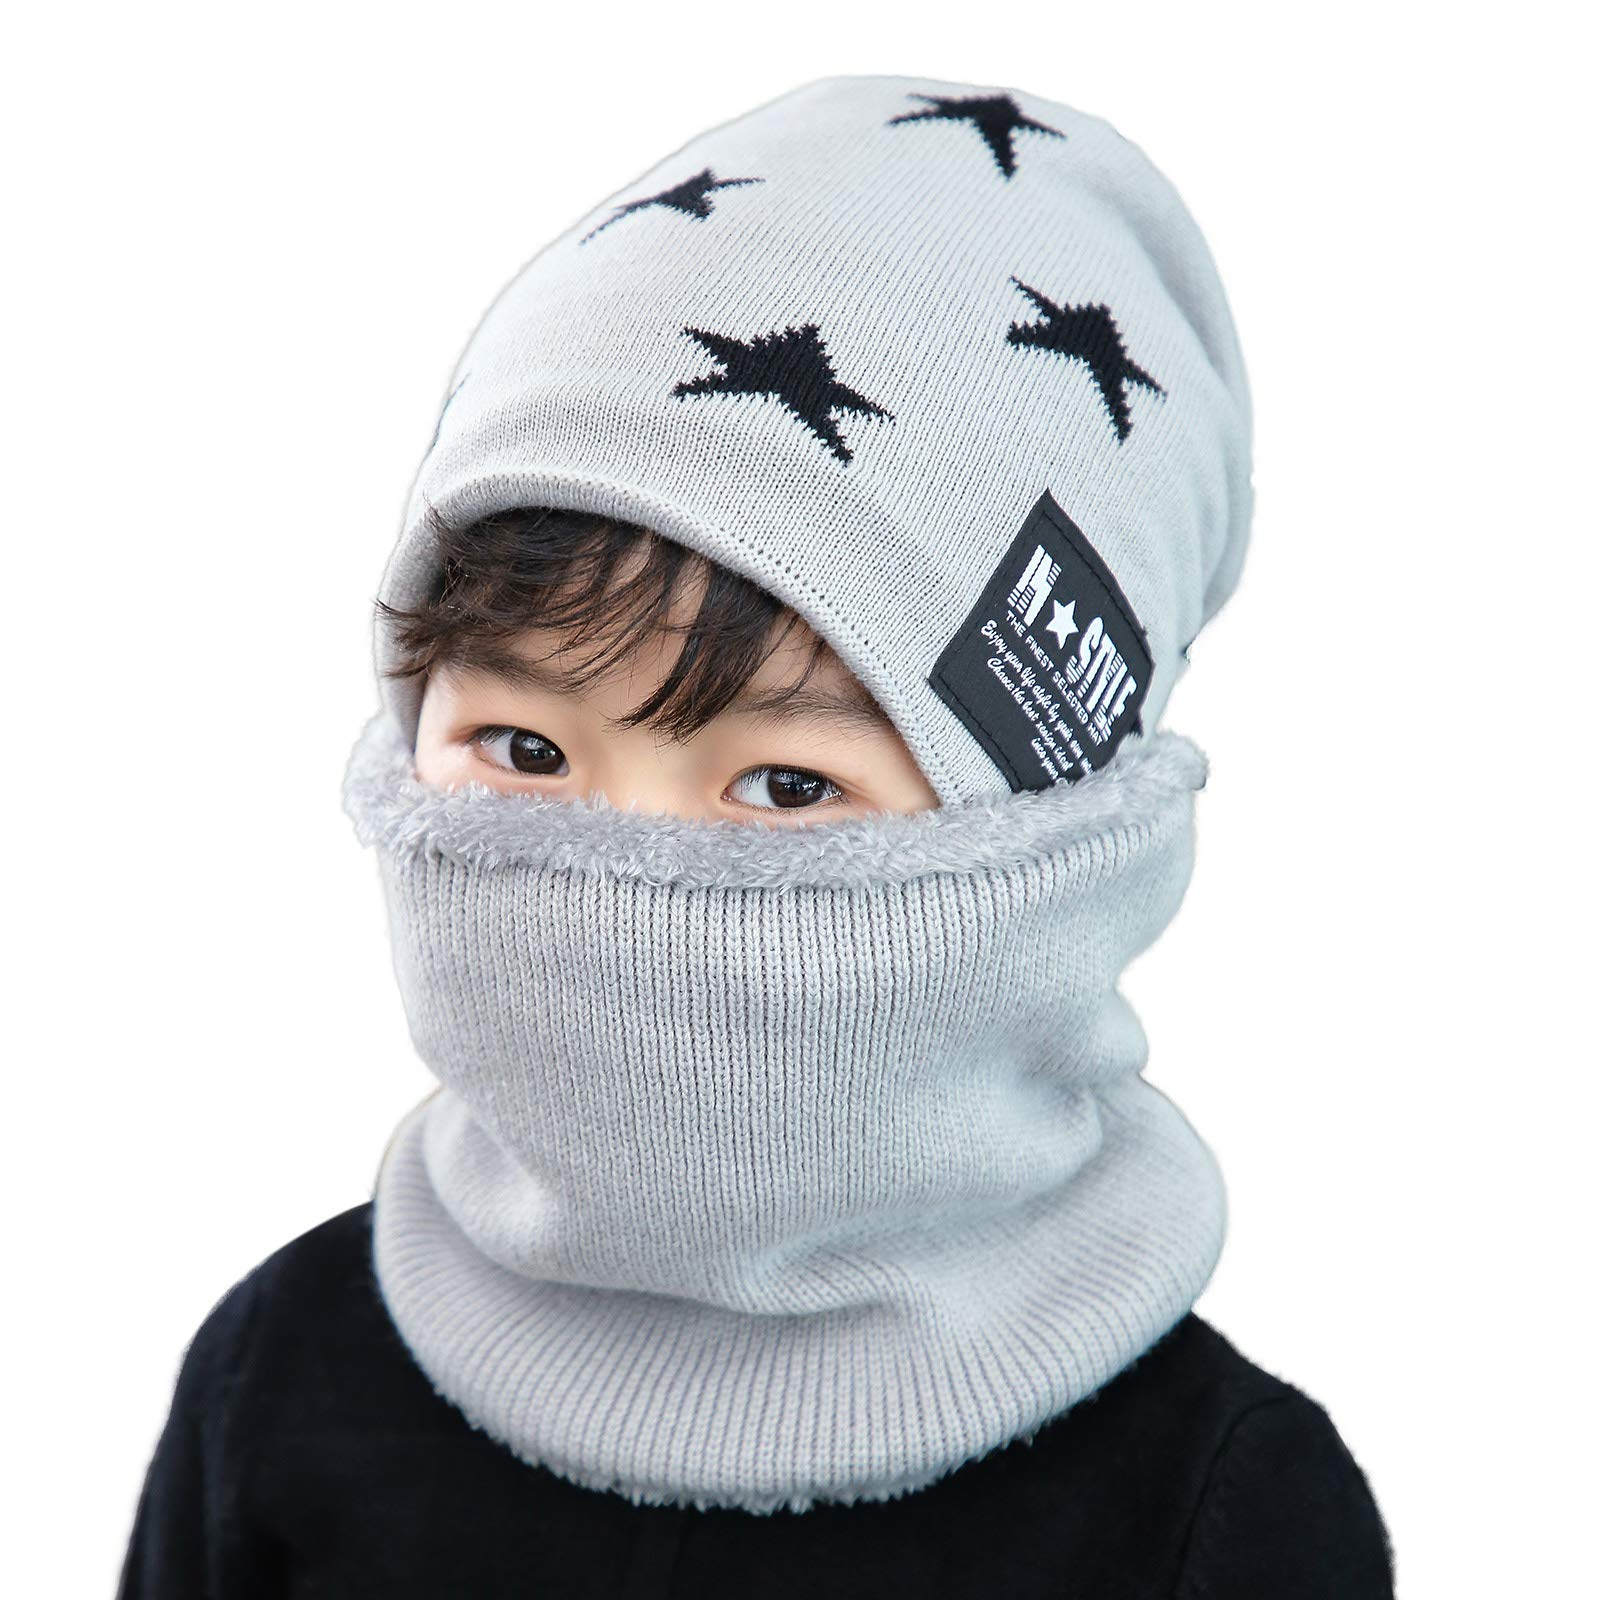 Flammi Knit Beanie Scarf Set Fleece Lined for Boys Girls Warm Snow Ski Skull Cap (Light Grey)